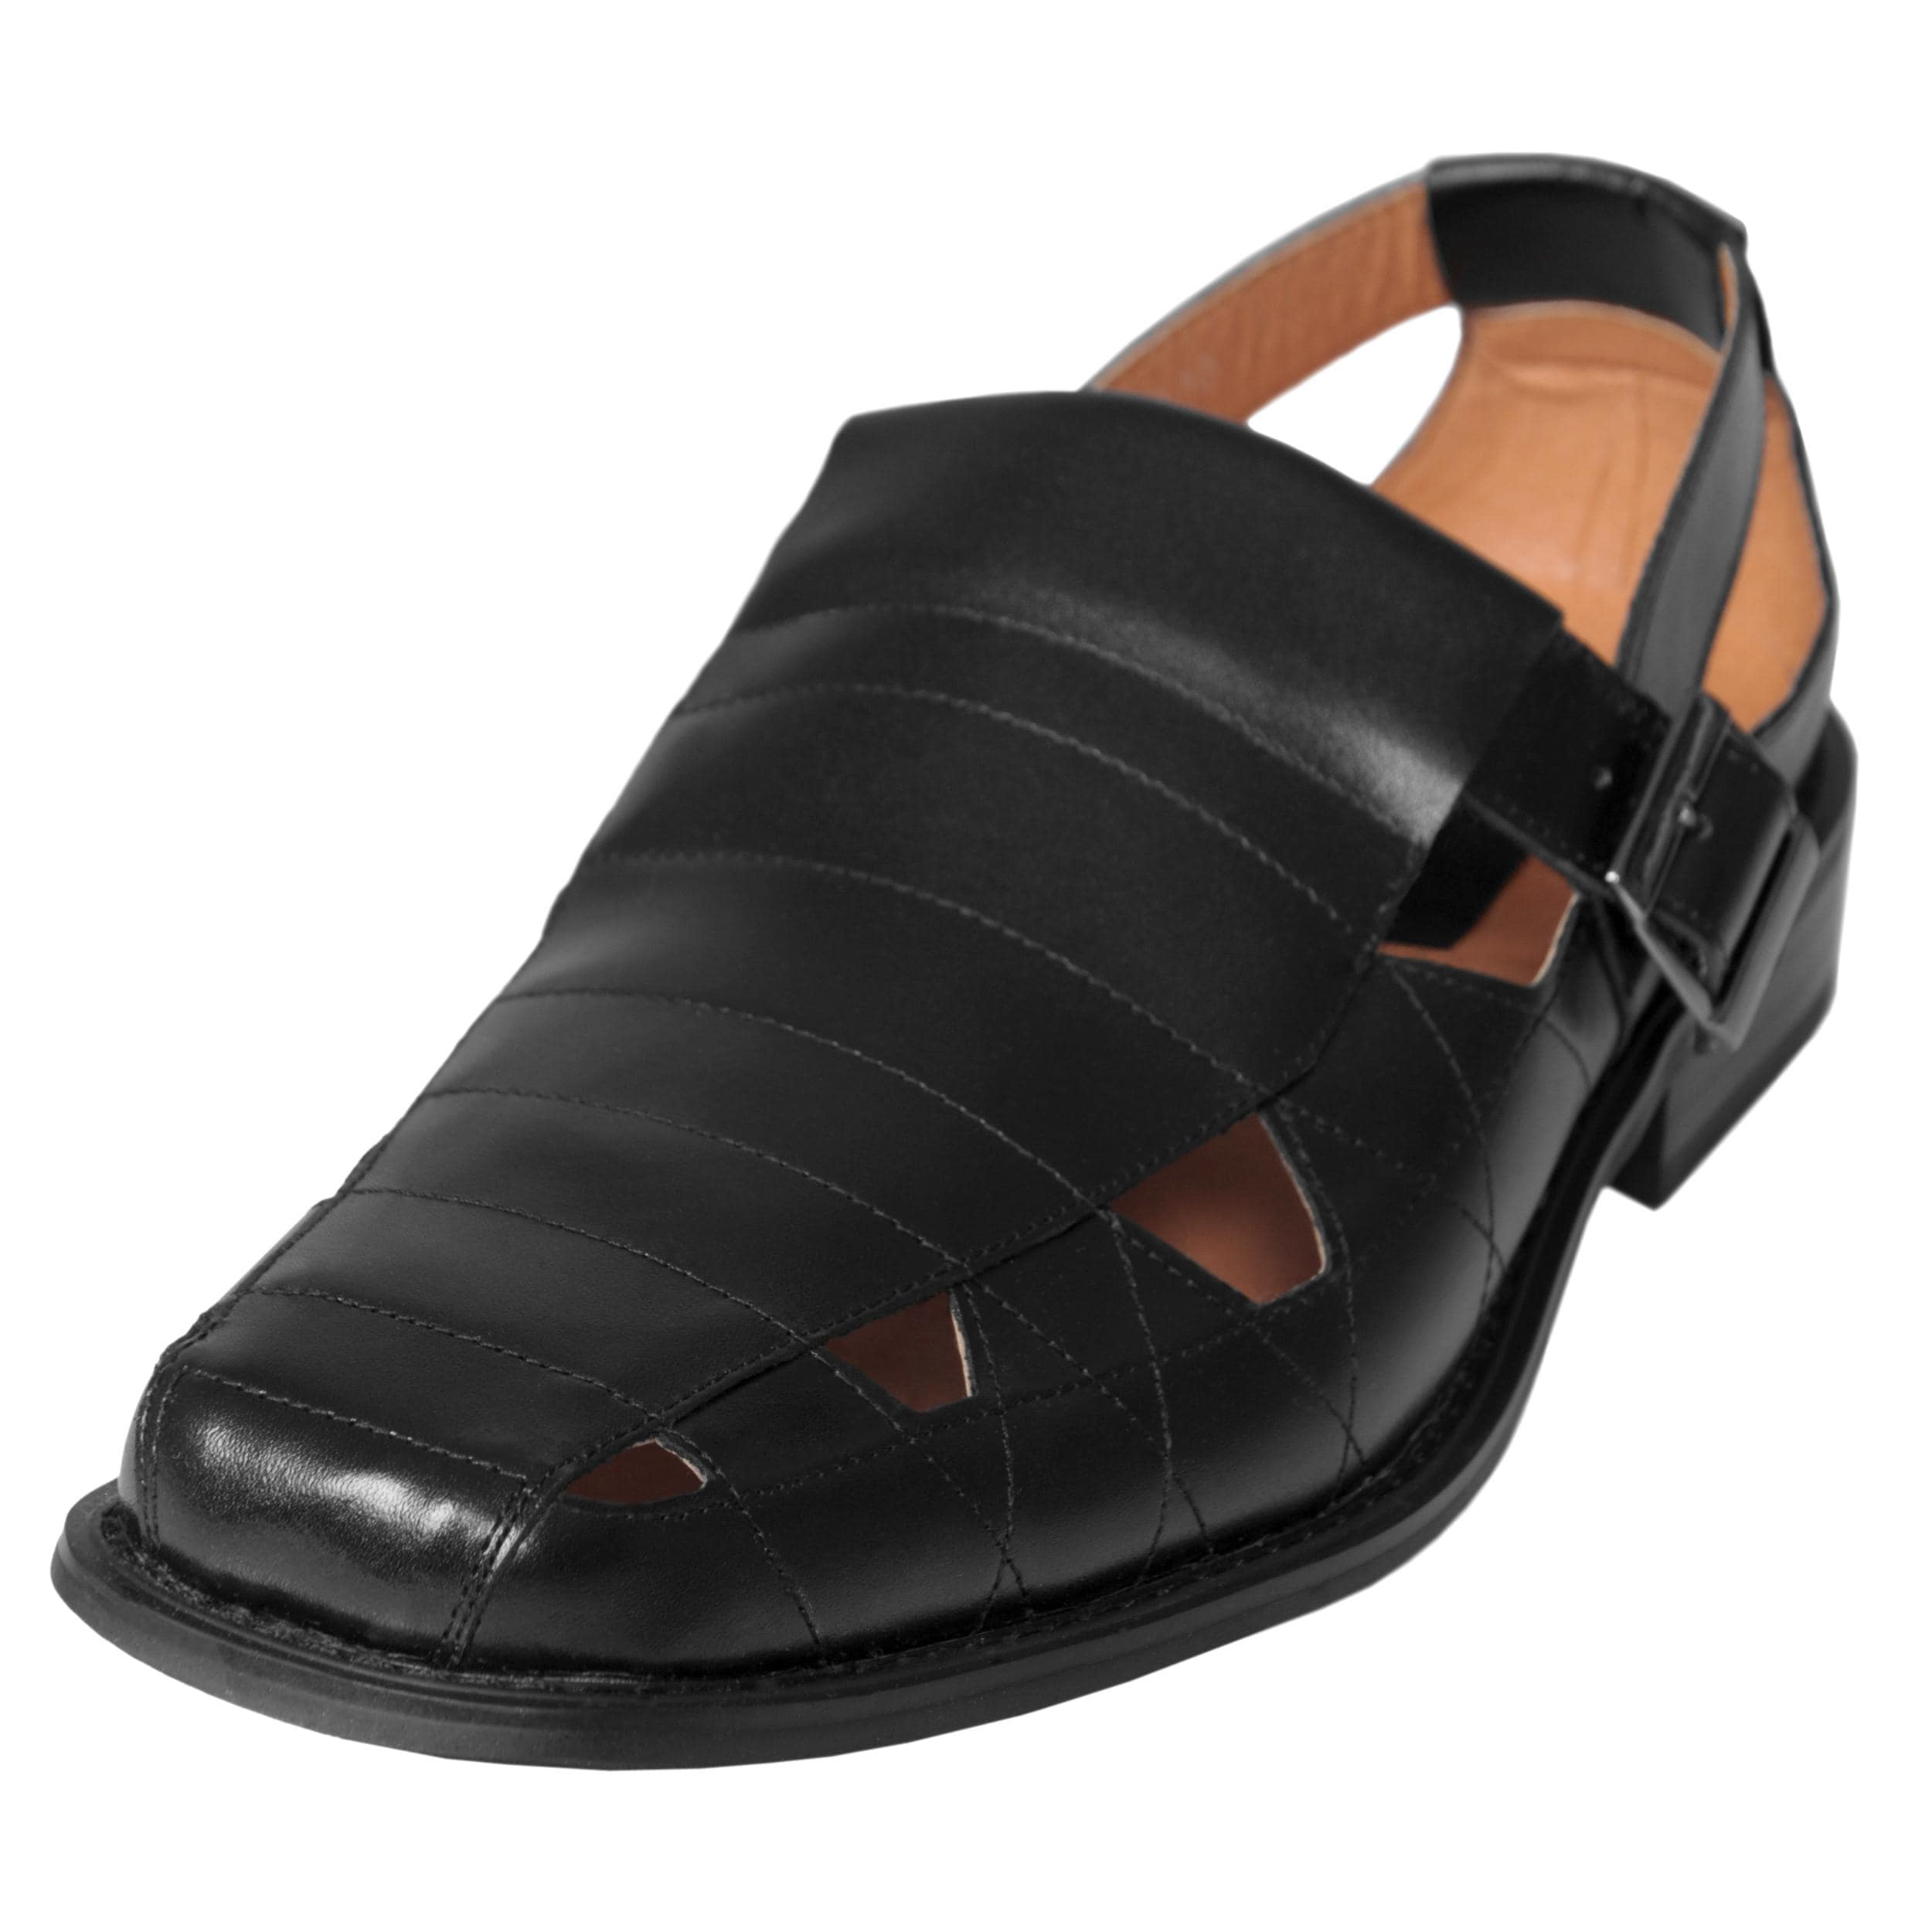 Boston Traveler Men's Leather Buckle Accent Sandals